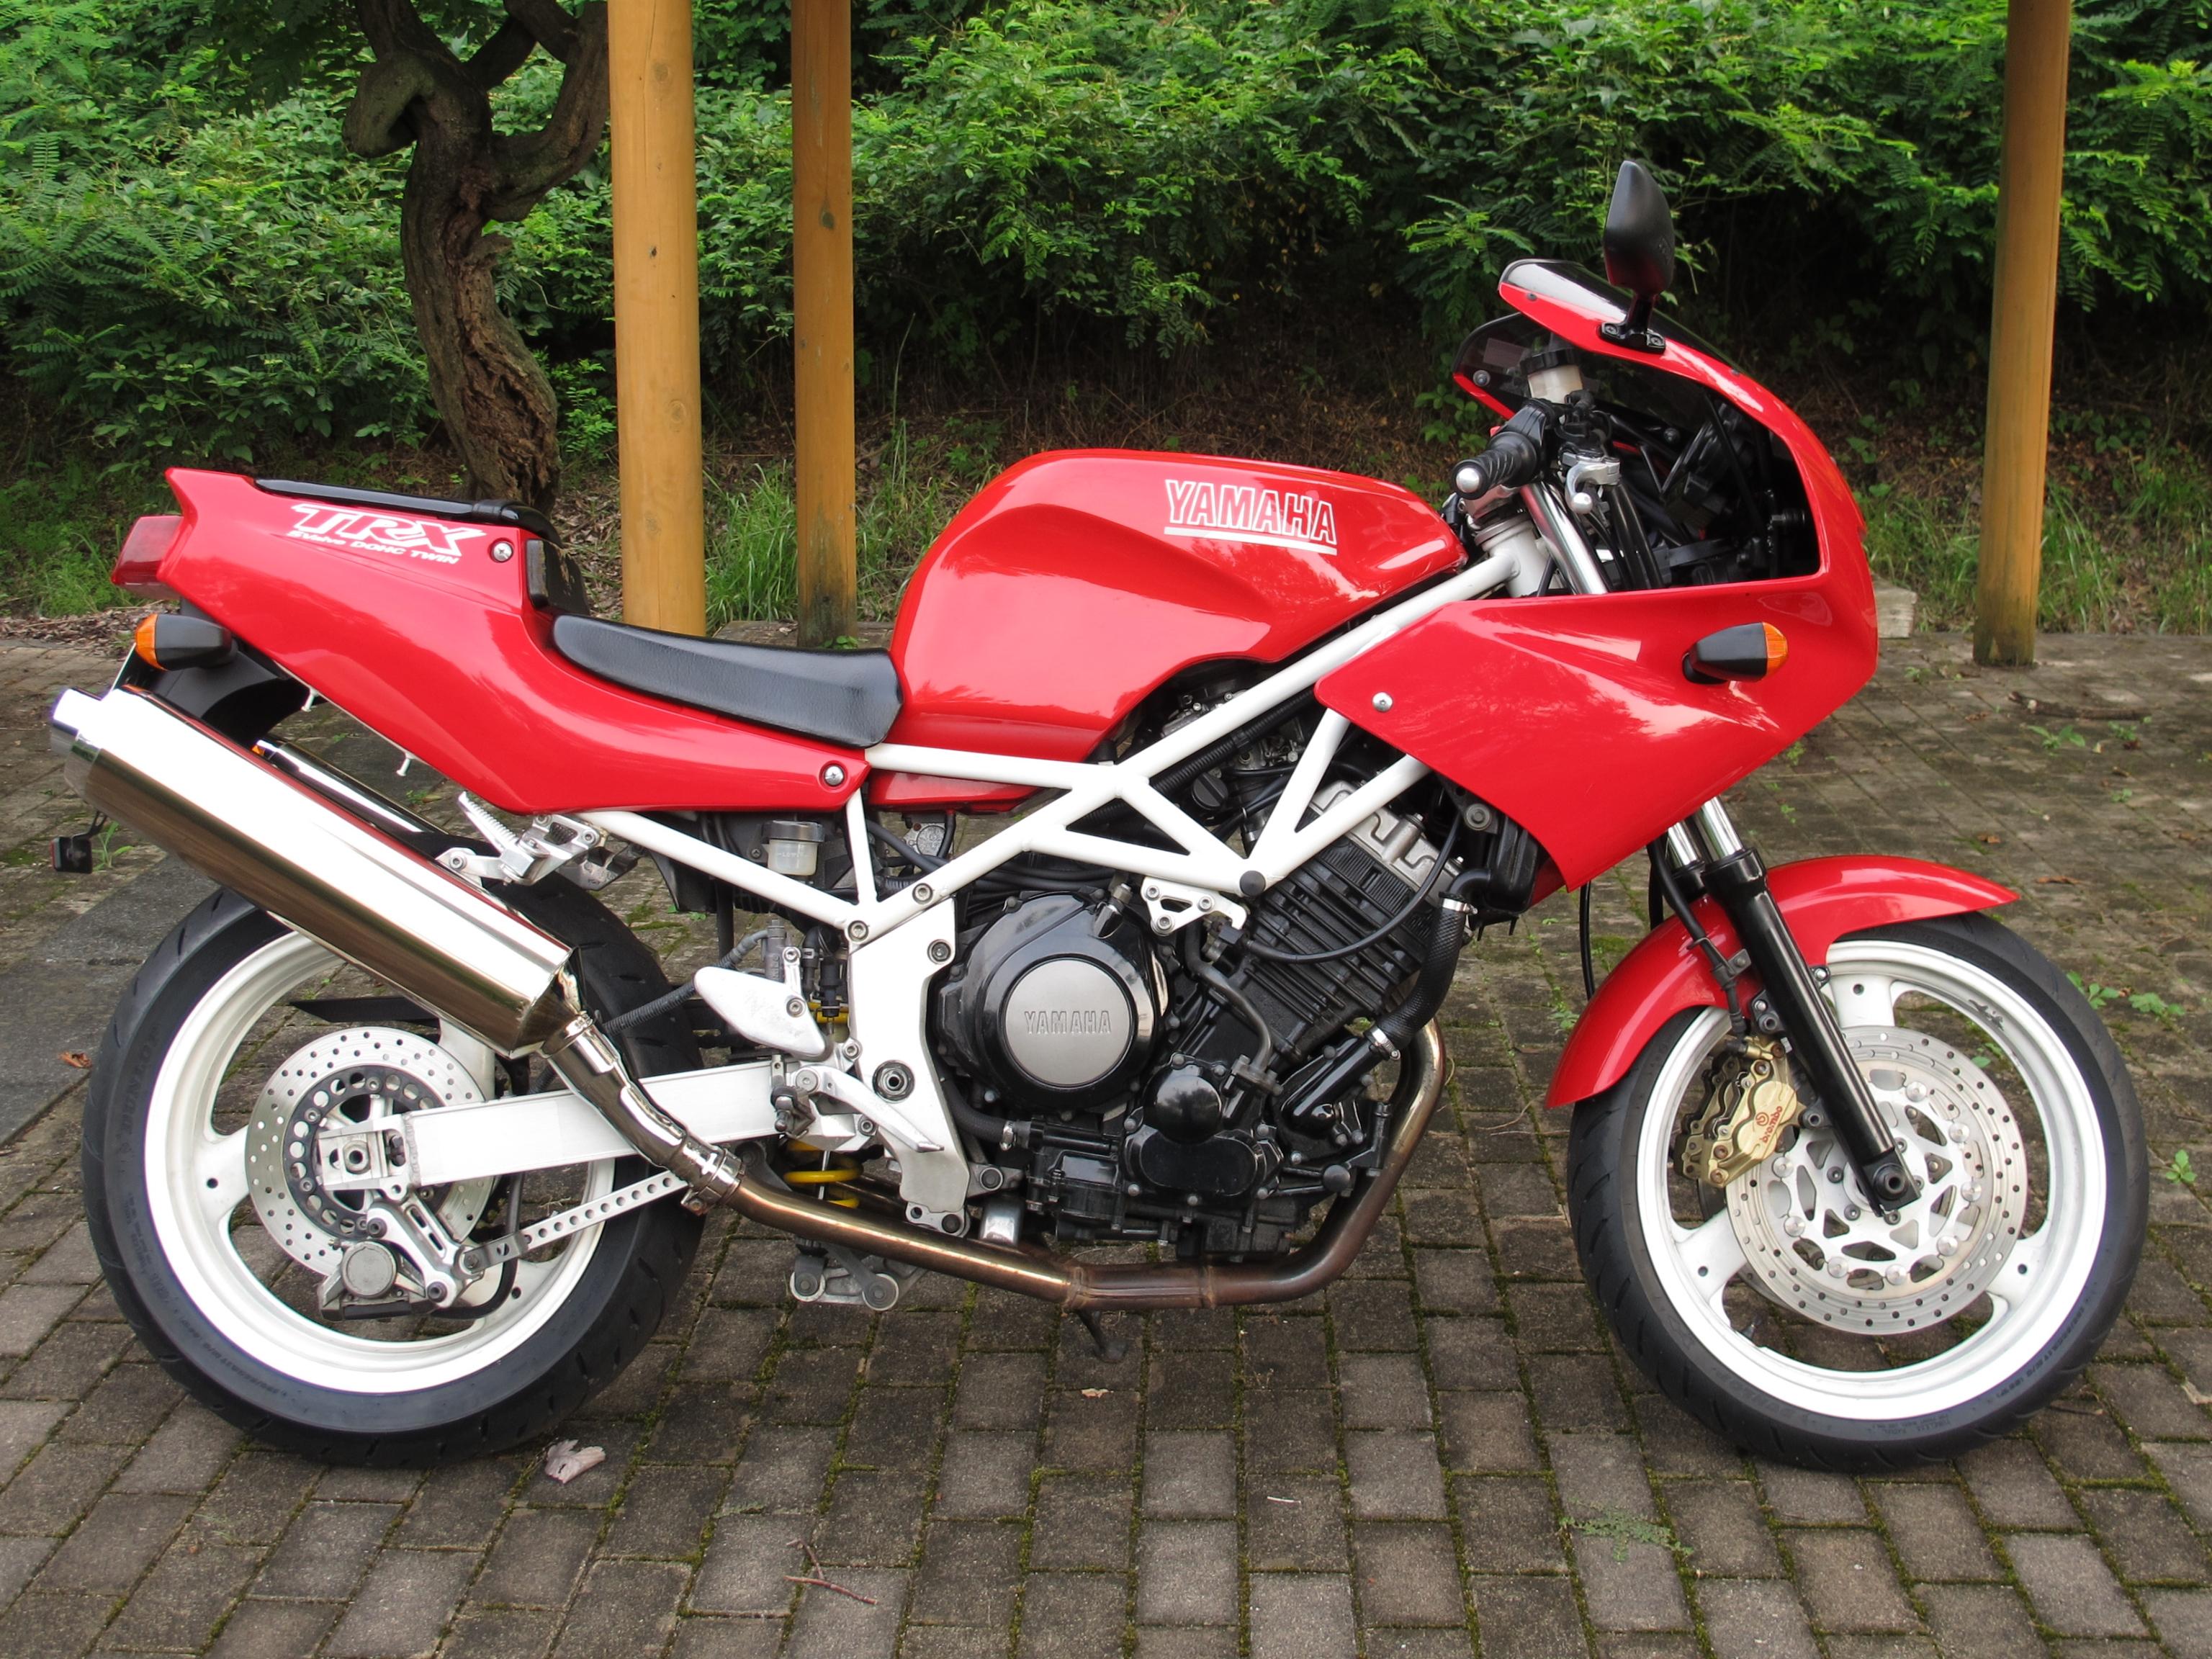 Where Are Yamaha Motorcycles Made